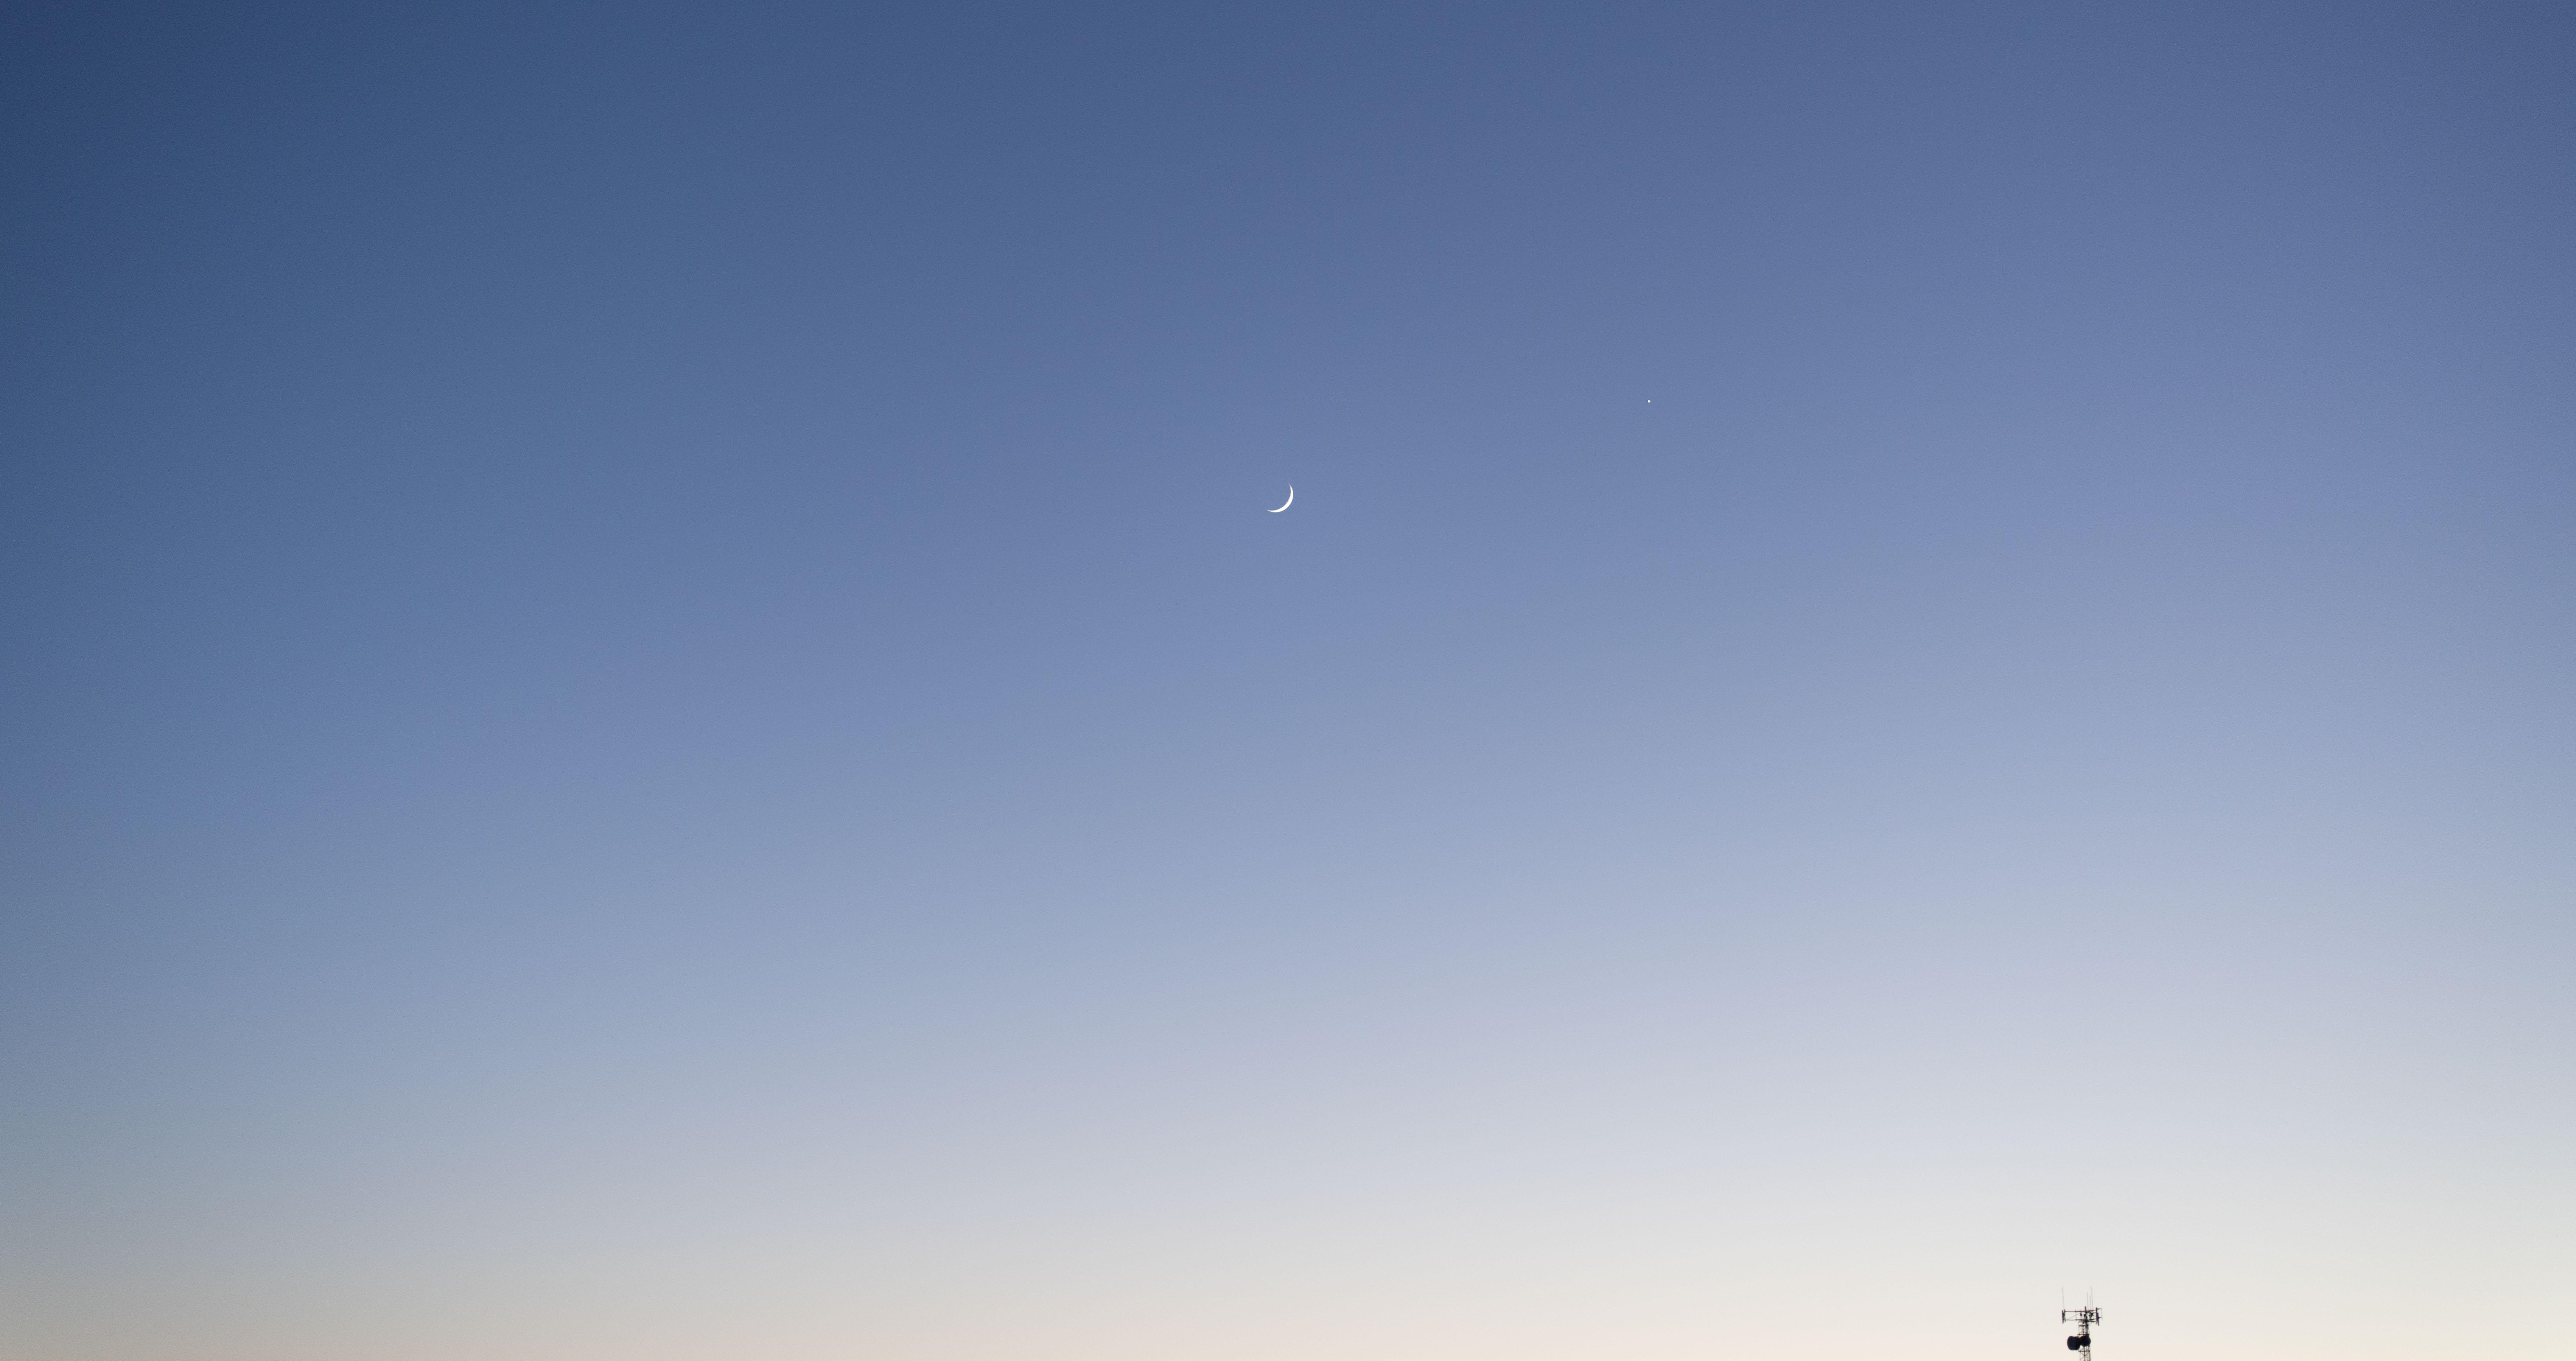 moon vs venus